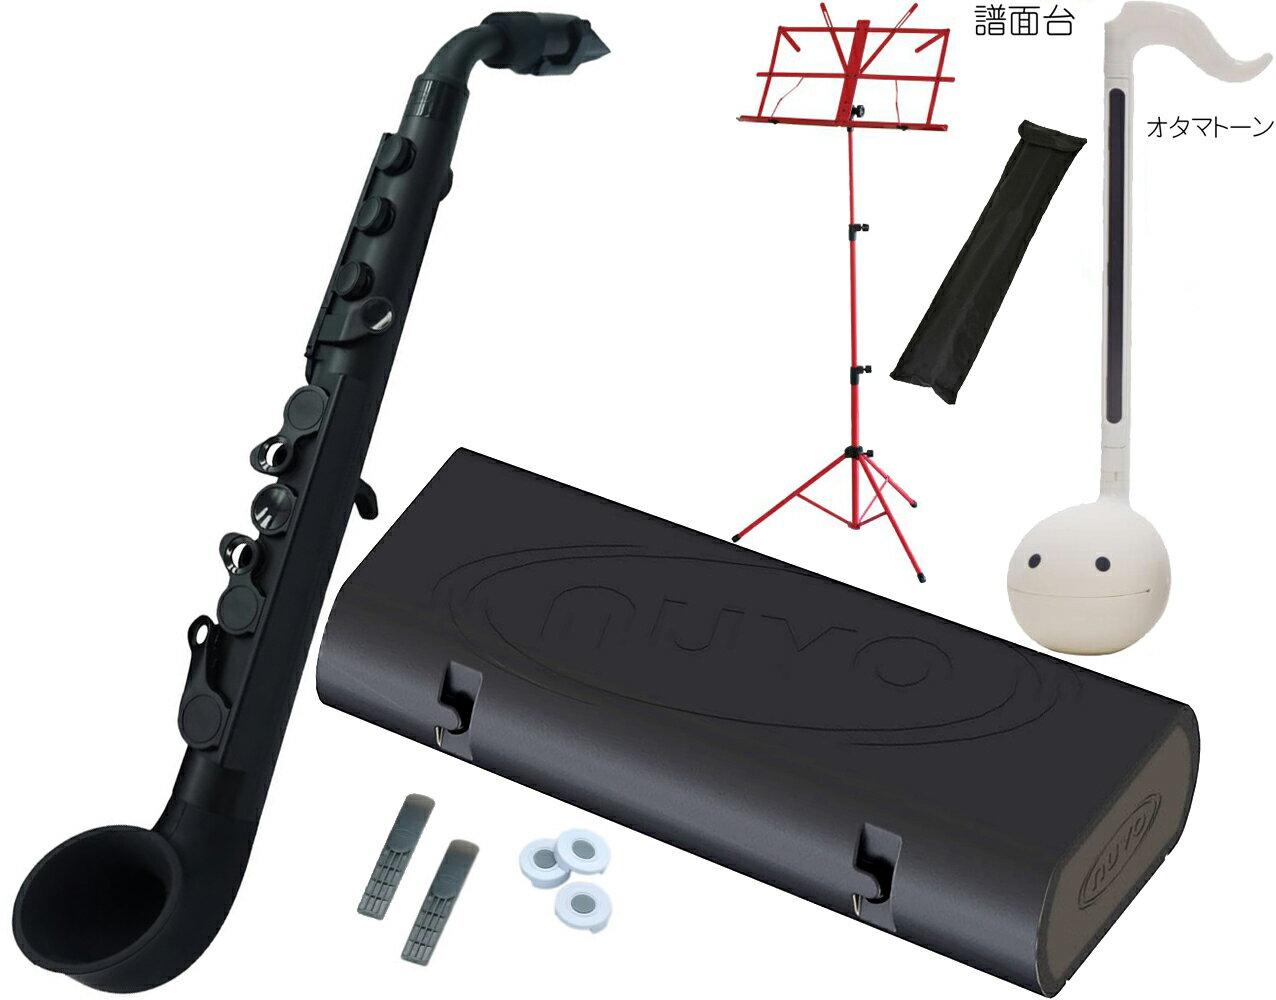 NUVO ( ヌーボ ) jSAX オール ブラック N520JBBK プラスチック製 管楽器 サックス系 リード楽器 本体 サクソフォン 黒色 Black 【 jサックス BK/BK セット L】